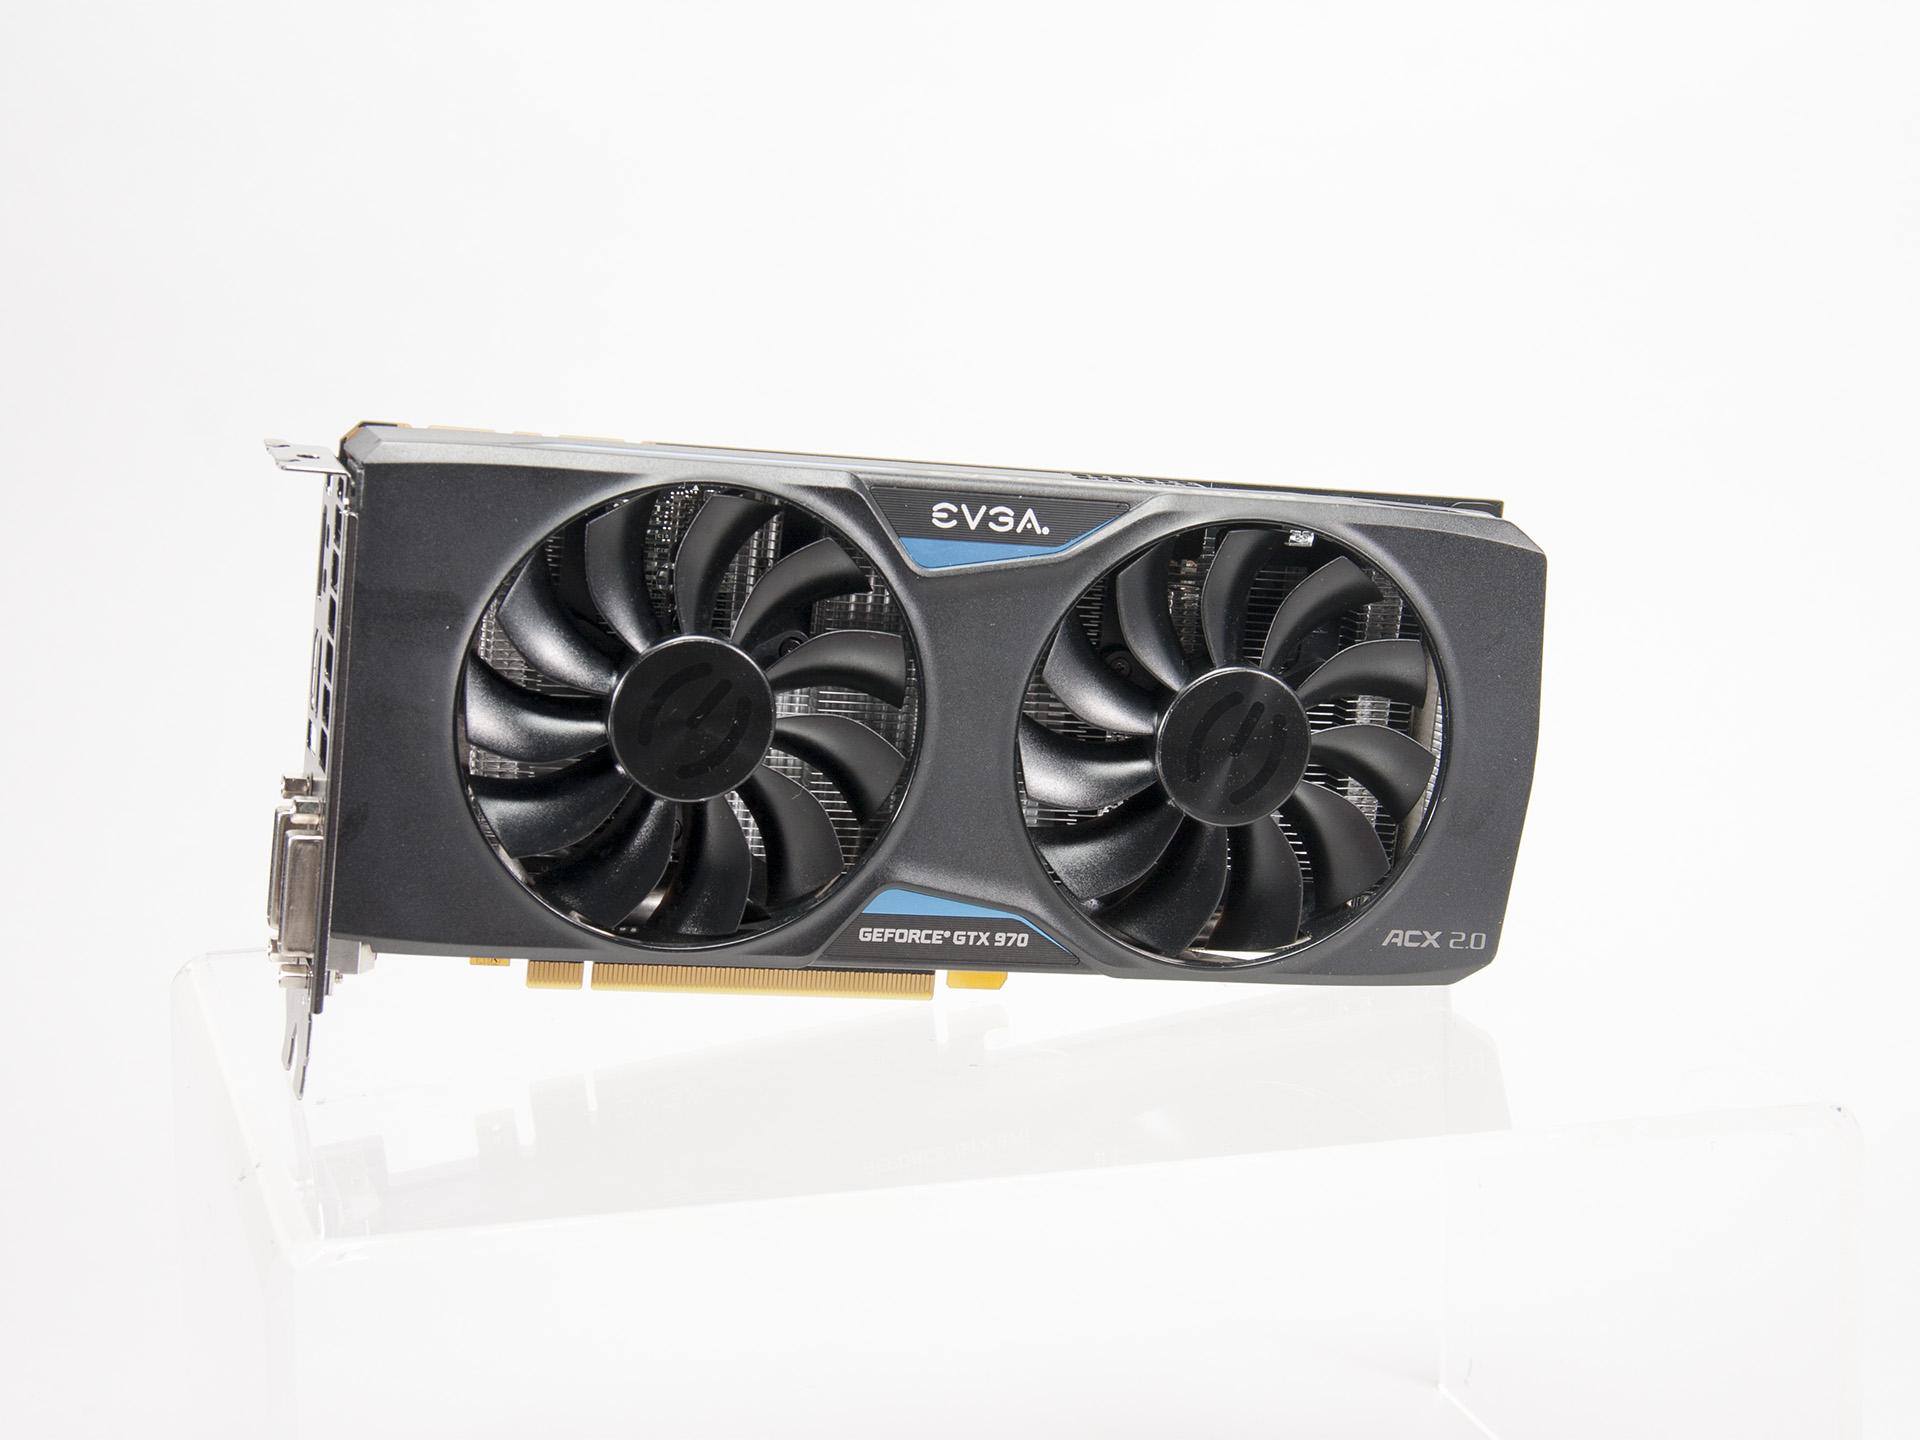 EVGA GeForce GTX 970 SSC ACX 2.0 搭載 HDT 散熱架構,三相馬達更穩定